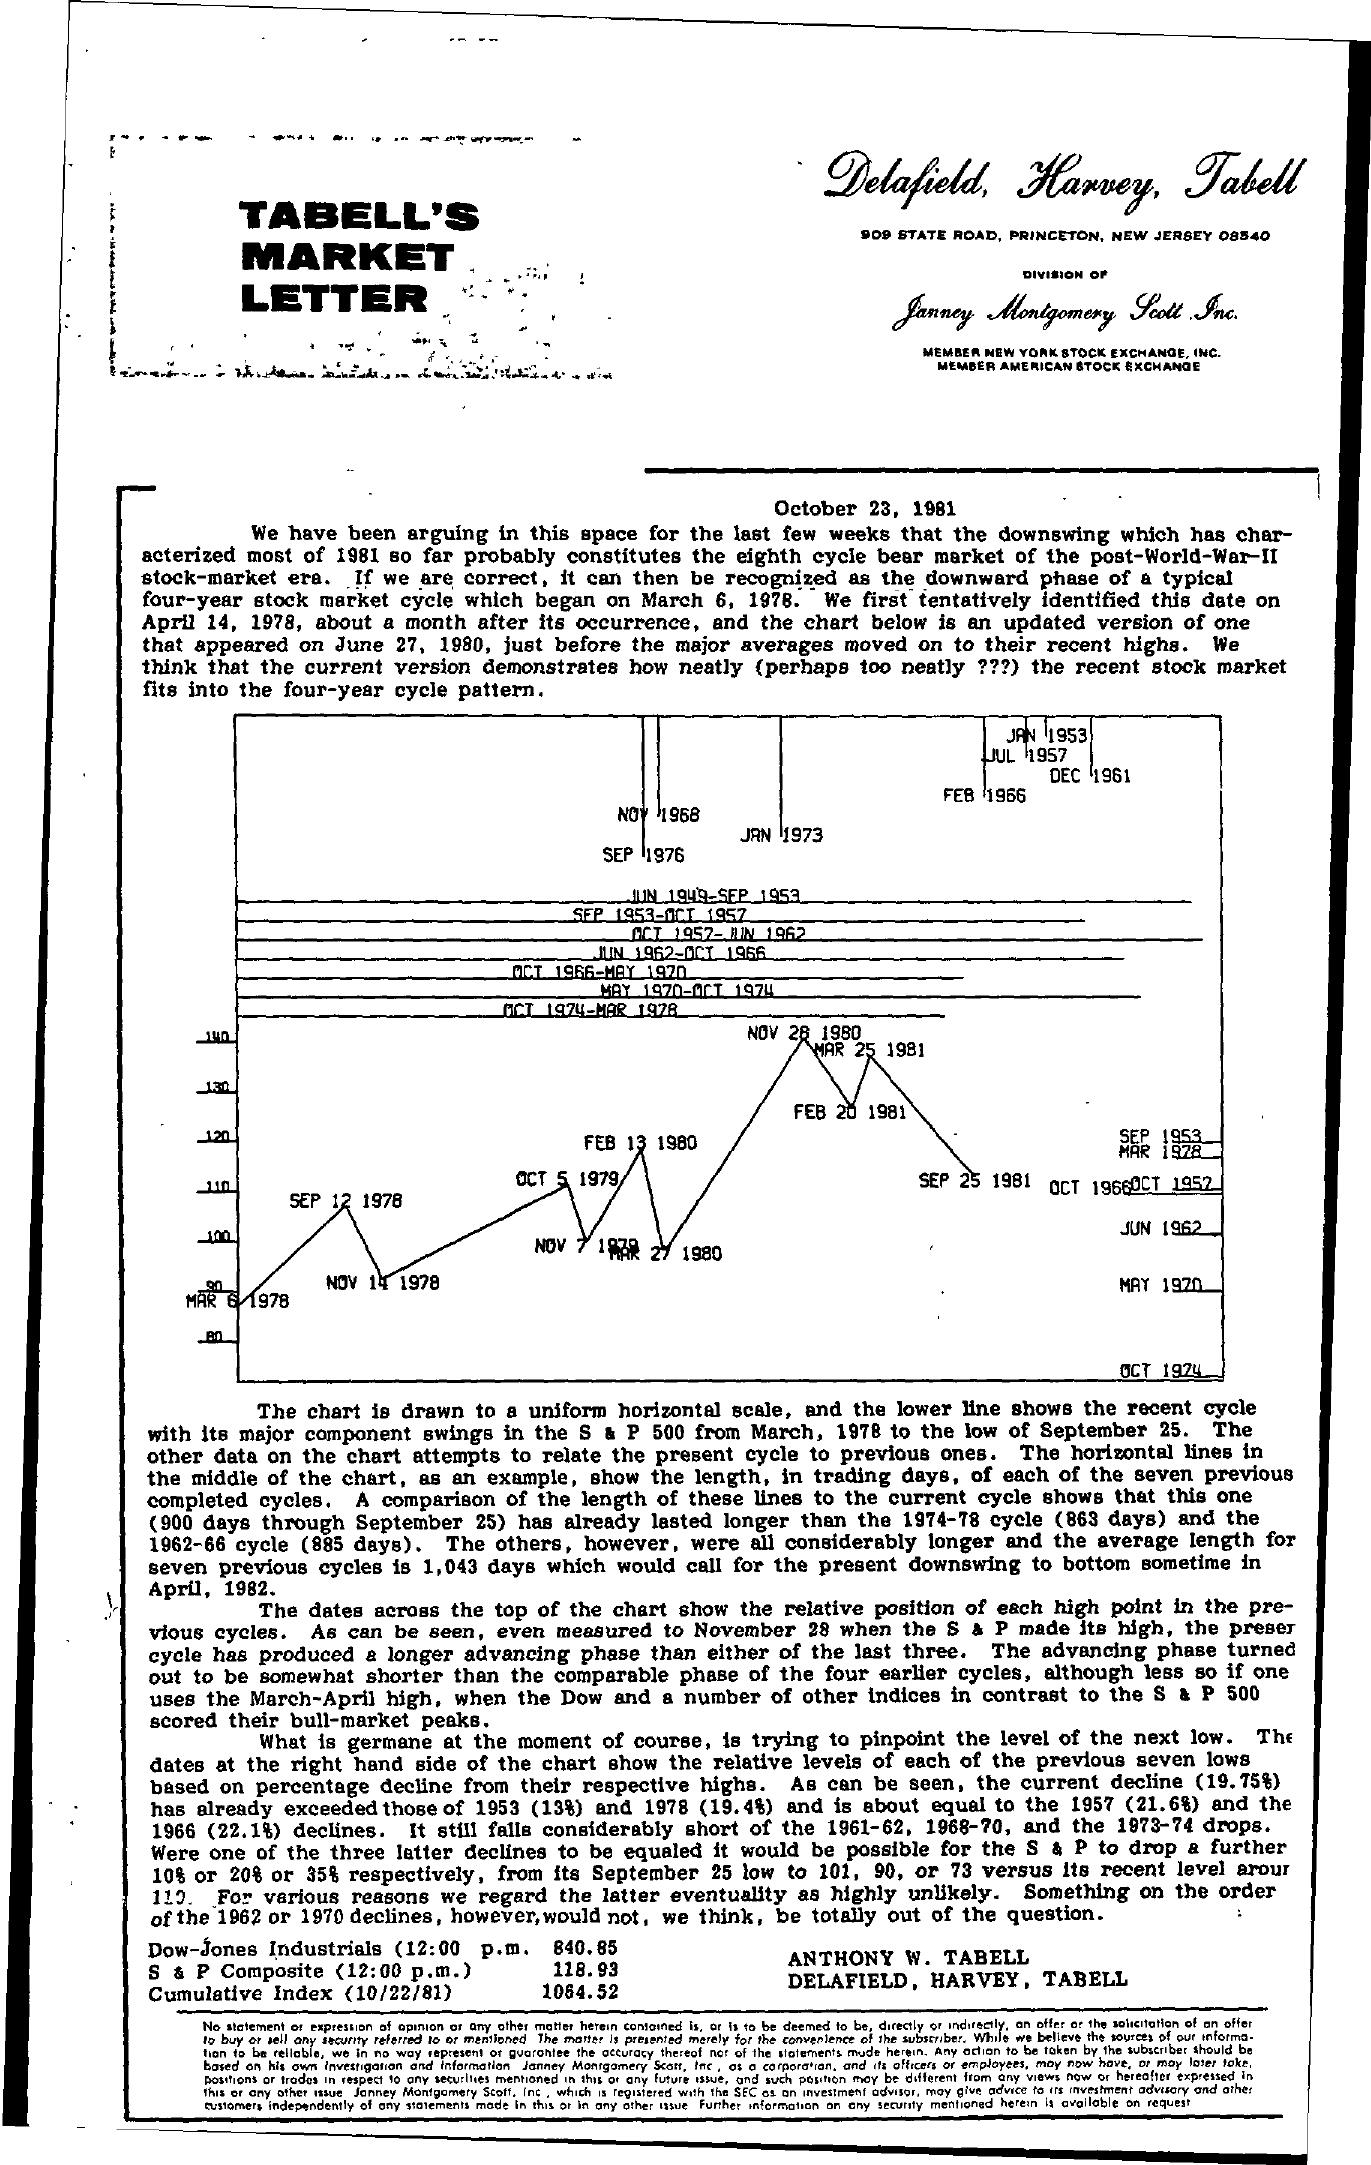 Tabell's Market Letter - October 23, 1981